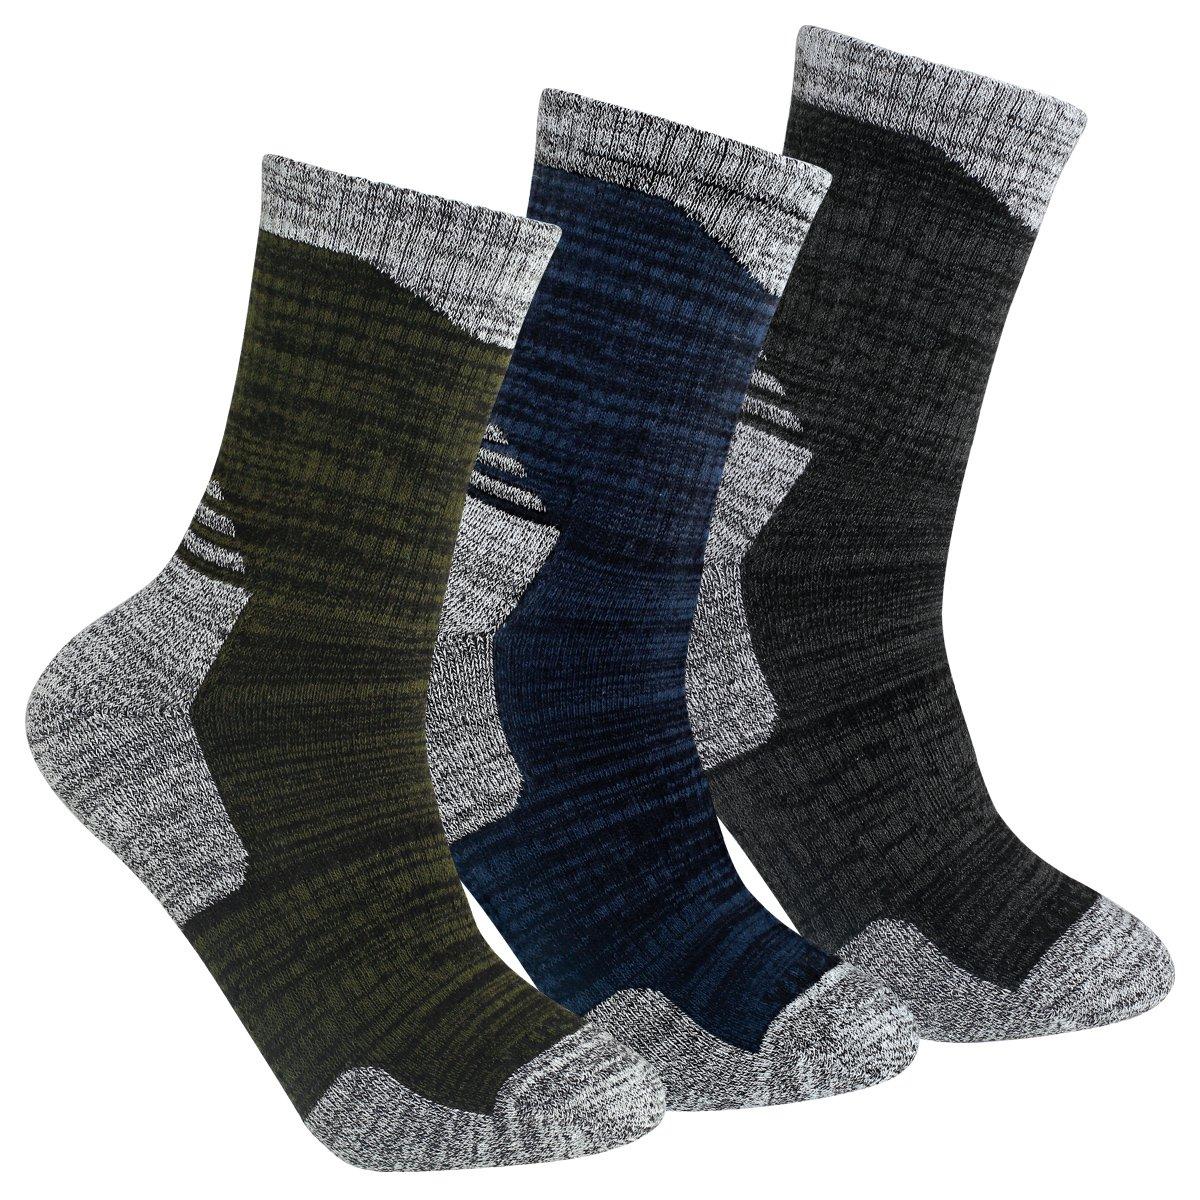 YUEDGE 3 Pairs Men's Cushion Crew Socks Outdoor Recreation Multi Performance Trekking Climbing Backpacking Hiking Socks